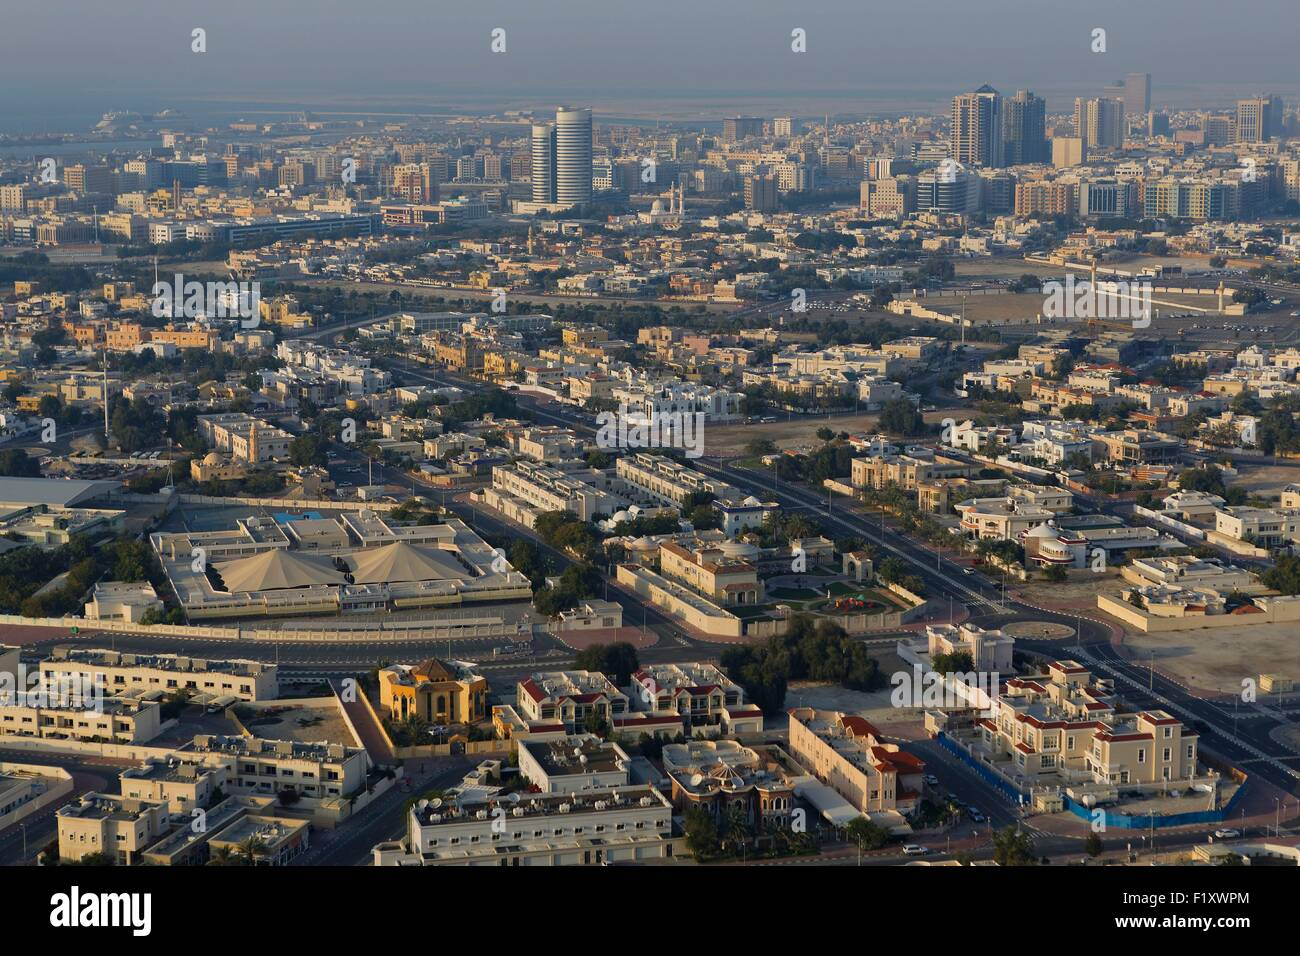 United Arab Emirates, Dubai, Bur Dubai area - Stock Image